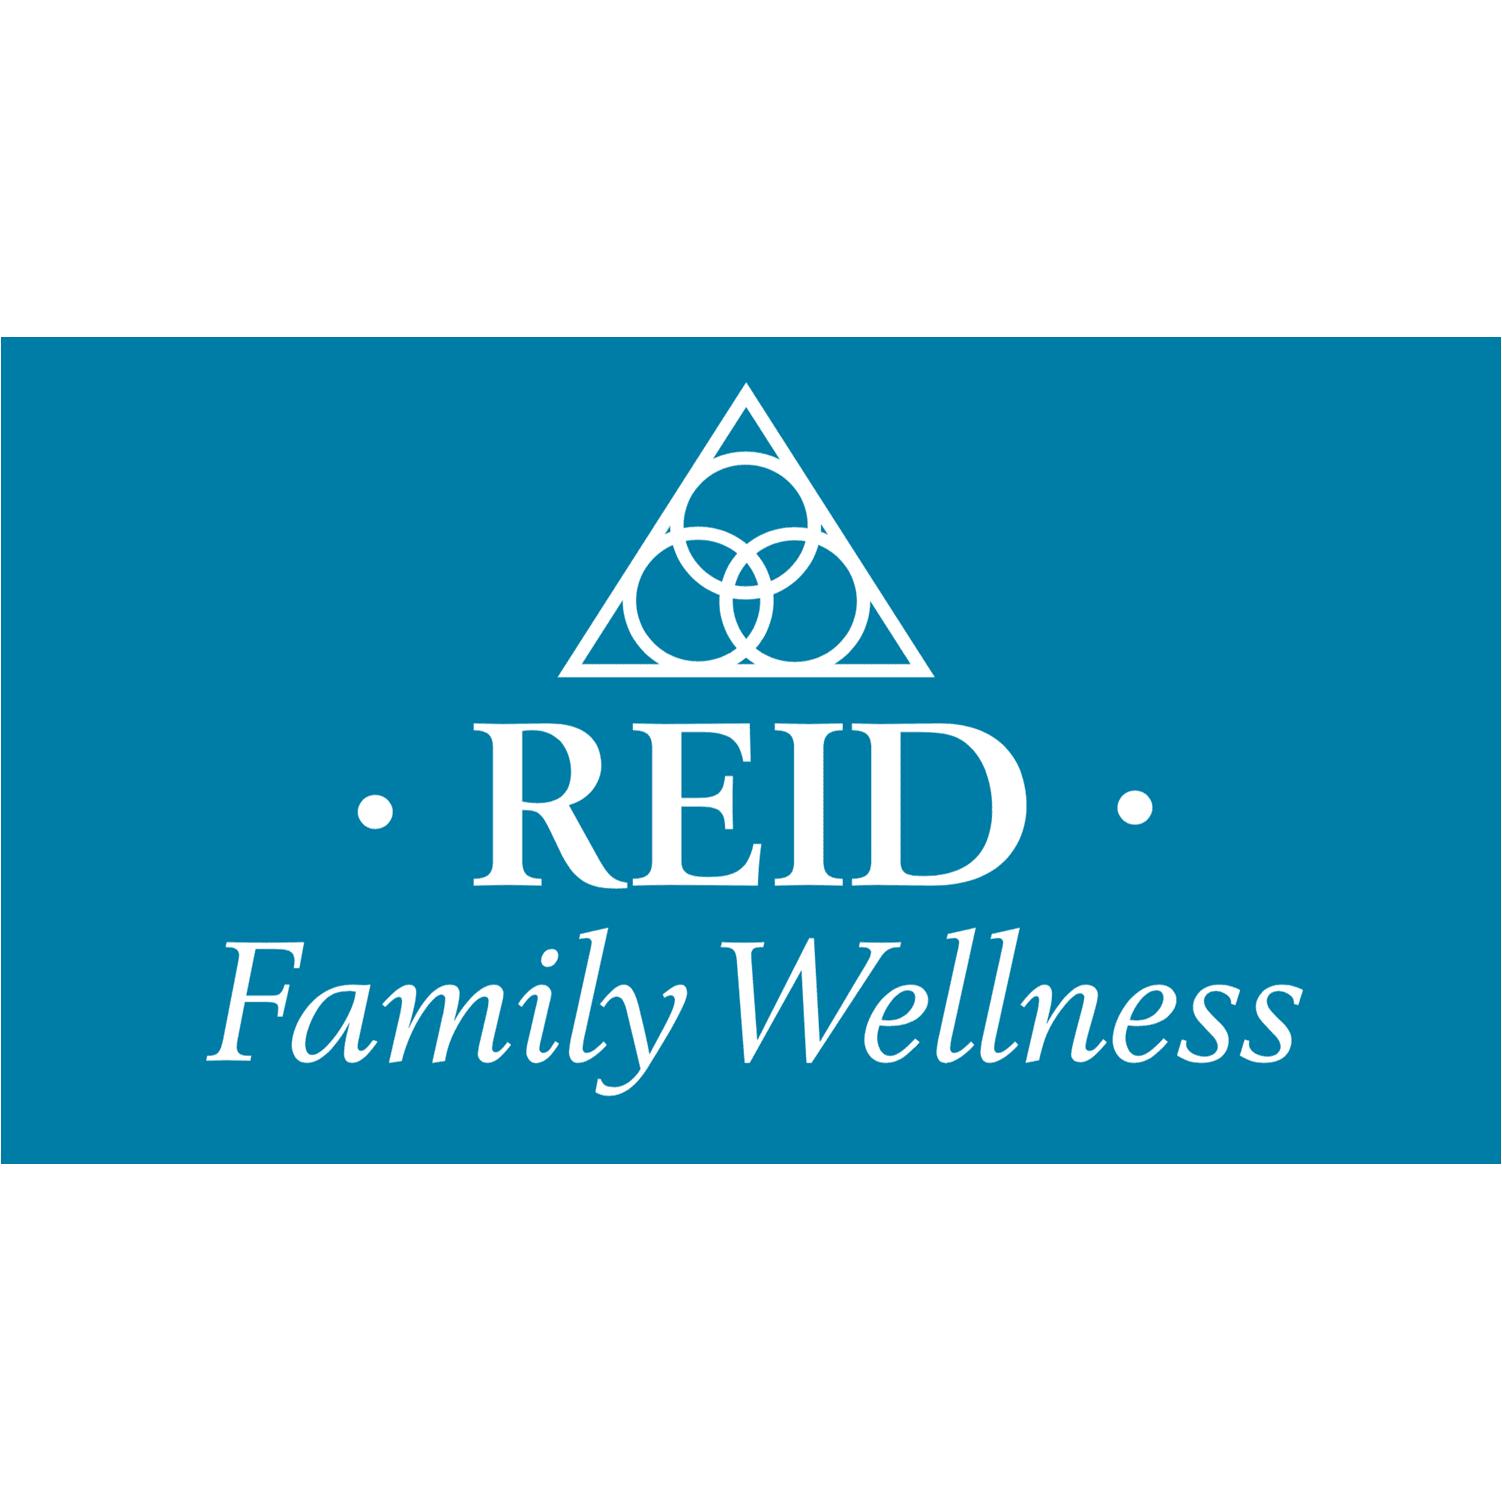 Reid Family Wellness - Springfield, IL - Health Clubs & Gyms